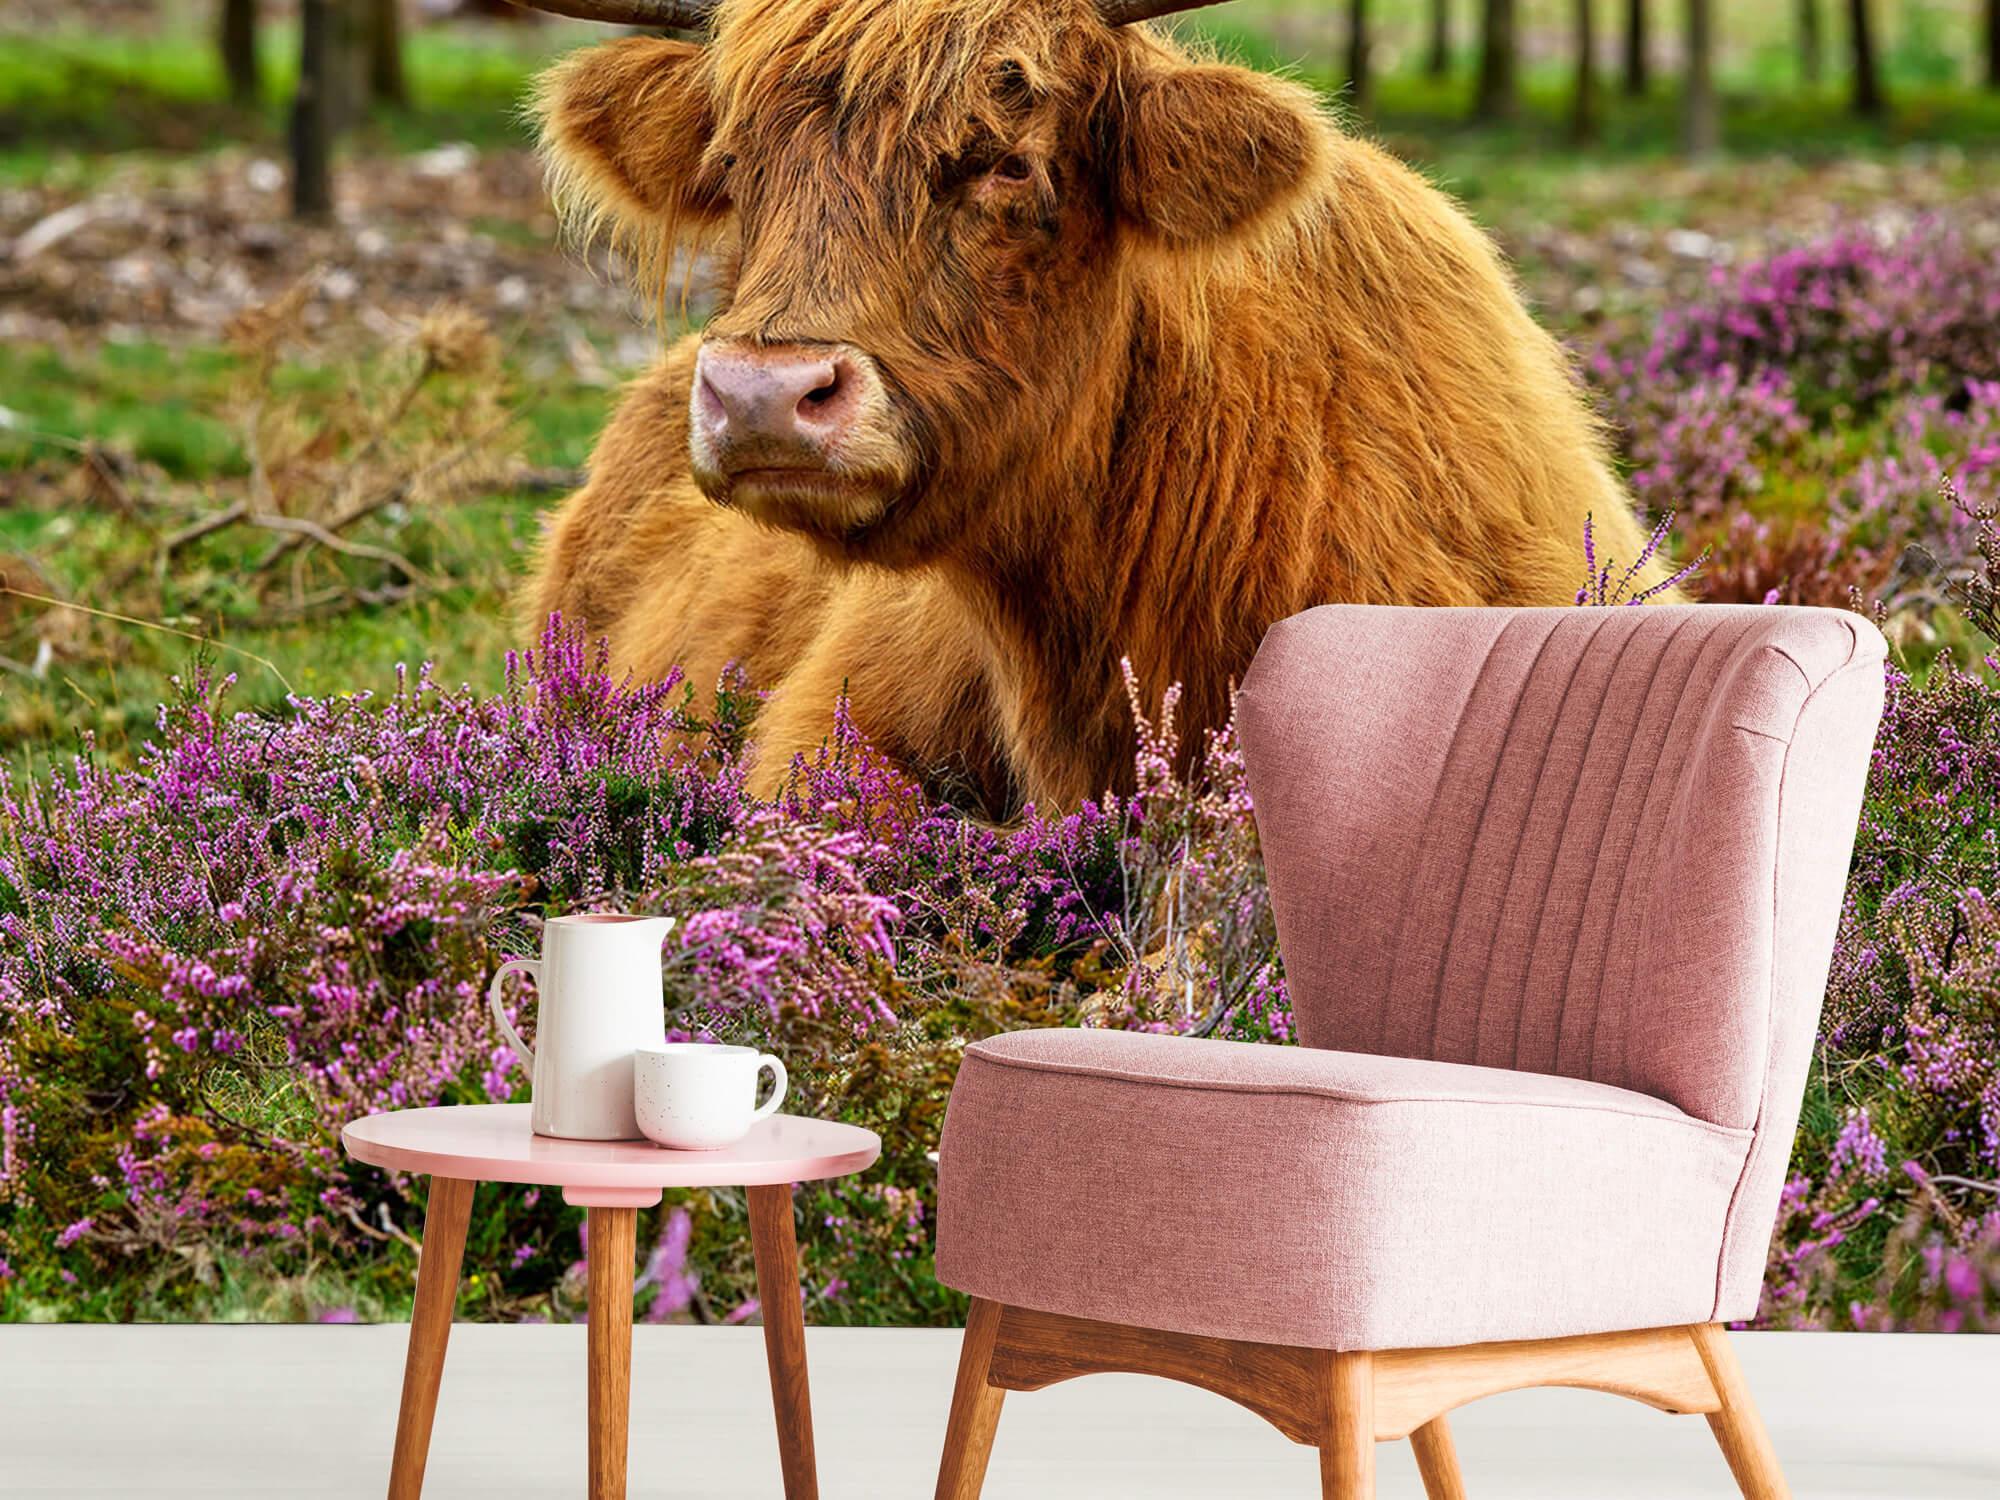 Hooglanders - Schotse hooglander tussen paarse heide 8